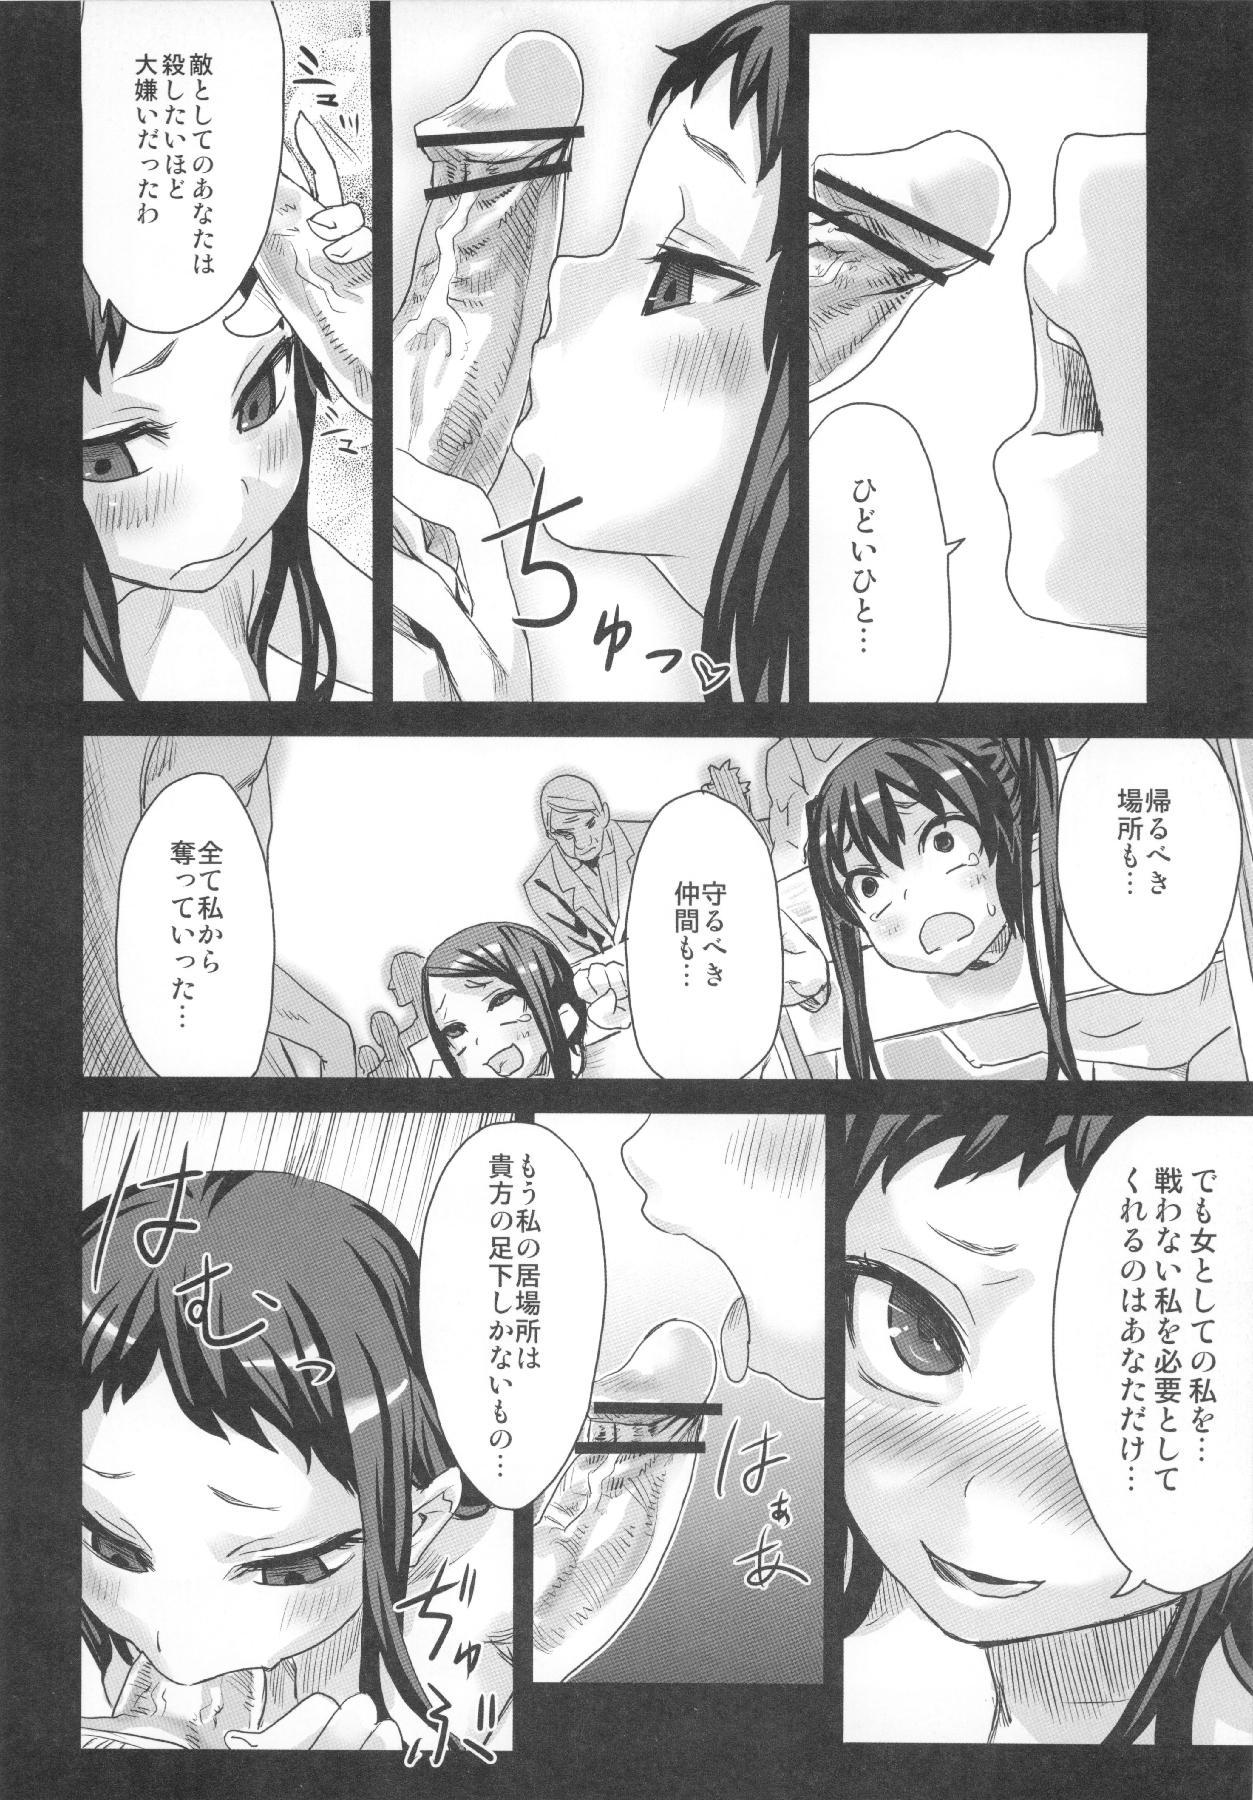 (C83) [Fatalpulse (Asanagi)] VictimGirls Compiled Vol.1 -Victimgirls Soushuuhen 1- MMO Game Selection (Various) 146